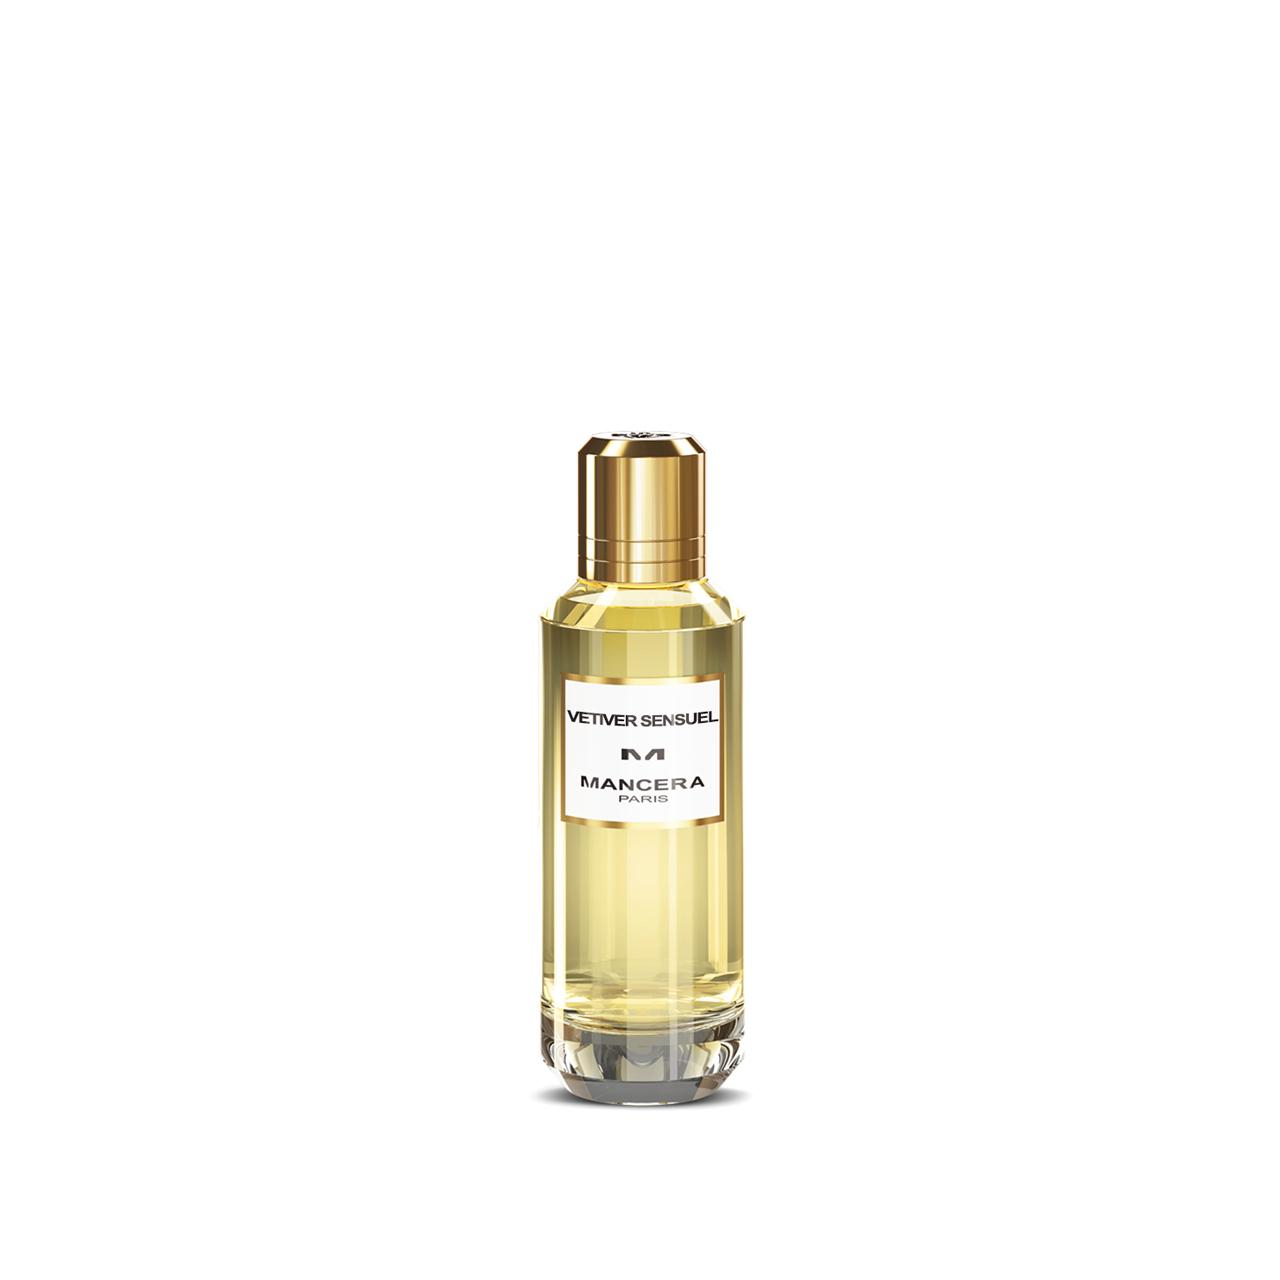 Vetiver Sensuel - Eau de Parfum